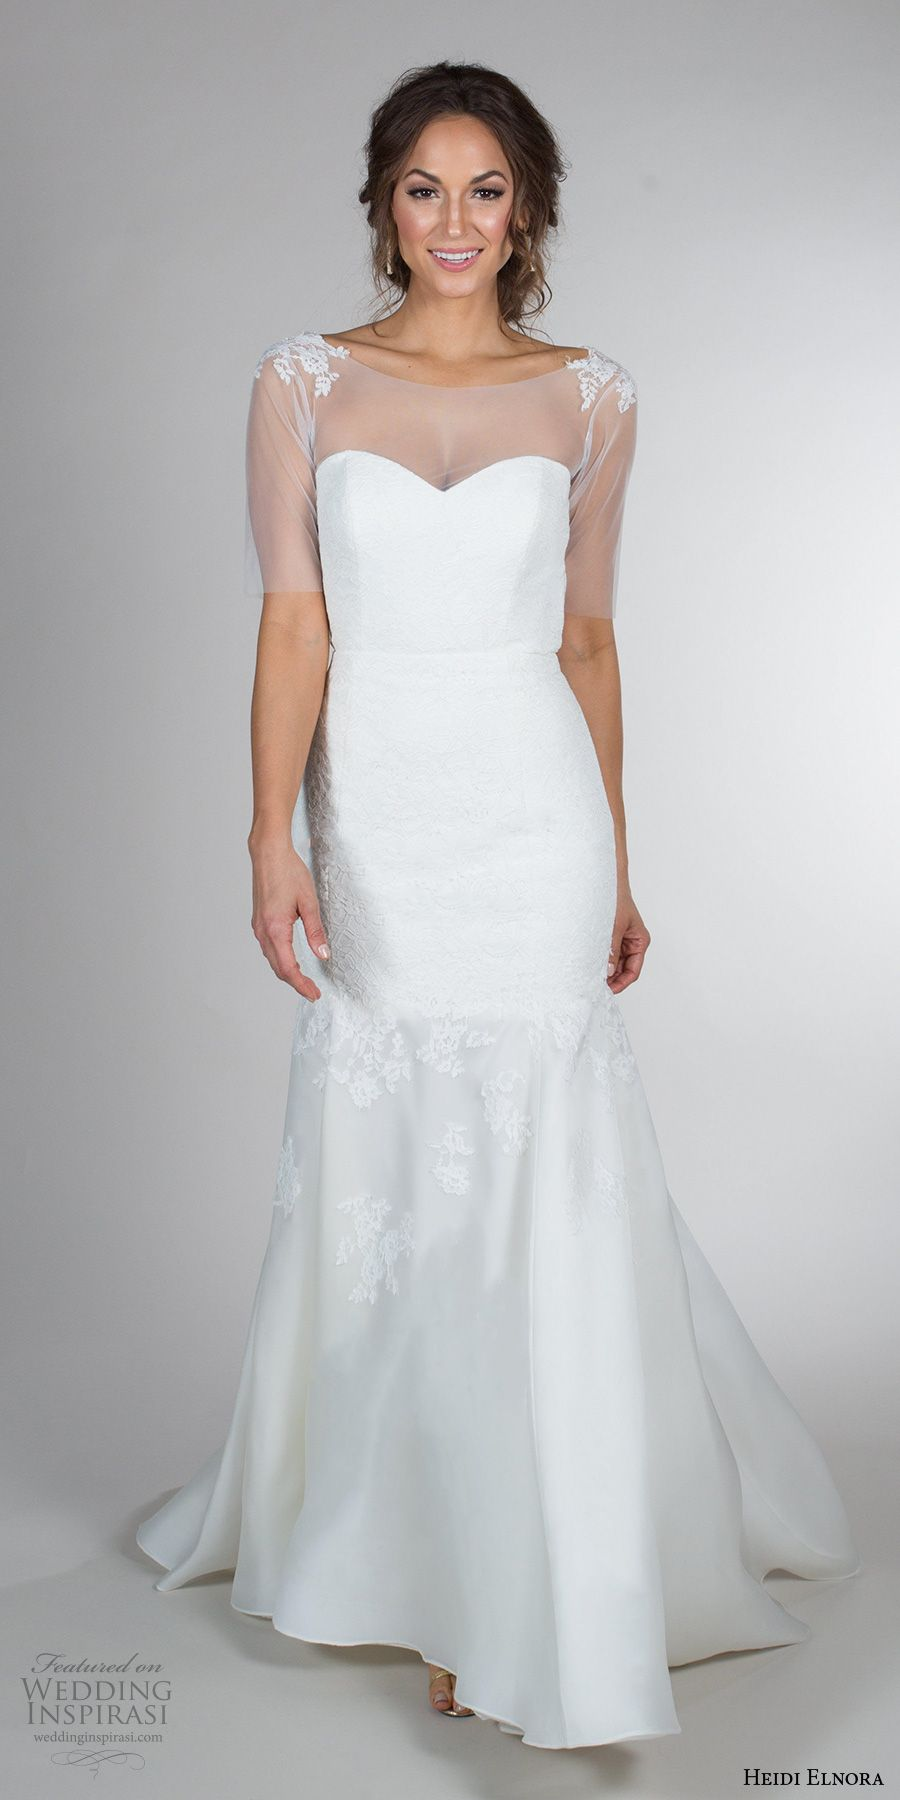 Wedding dress with bow on back  Heidi Elnora Fall  Wedding Dresses u ucAnniversaryud Bridal